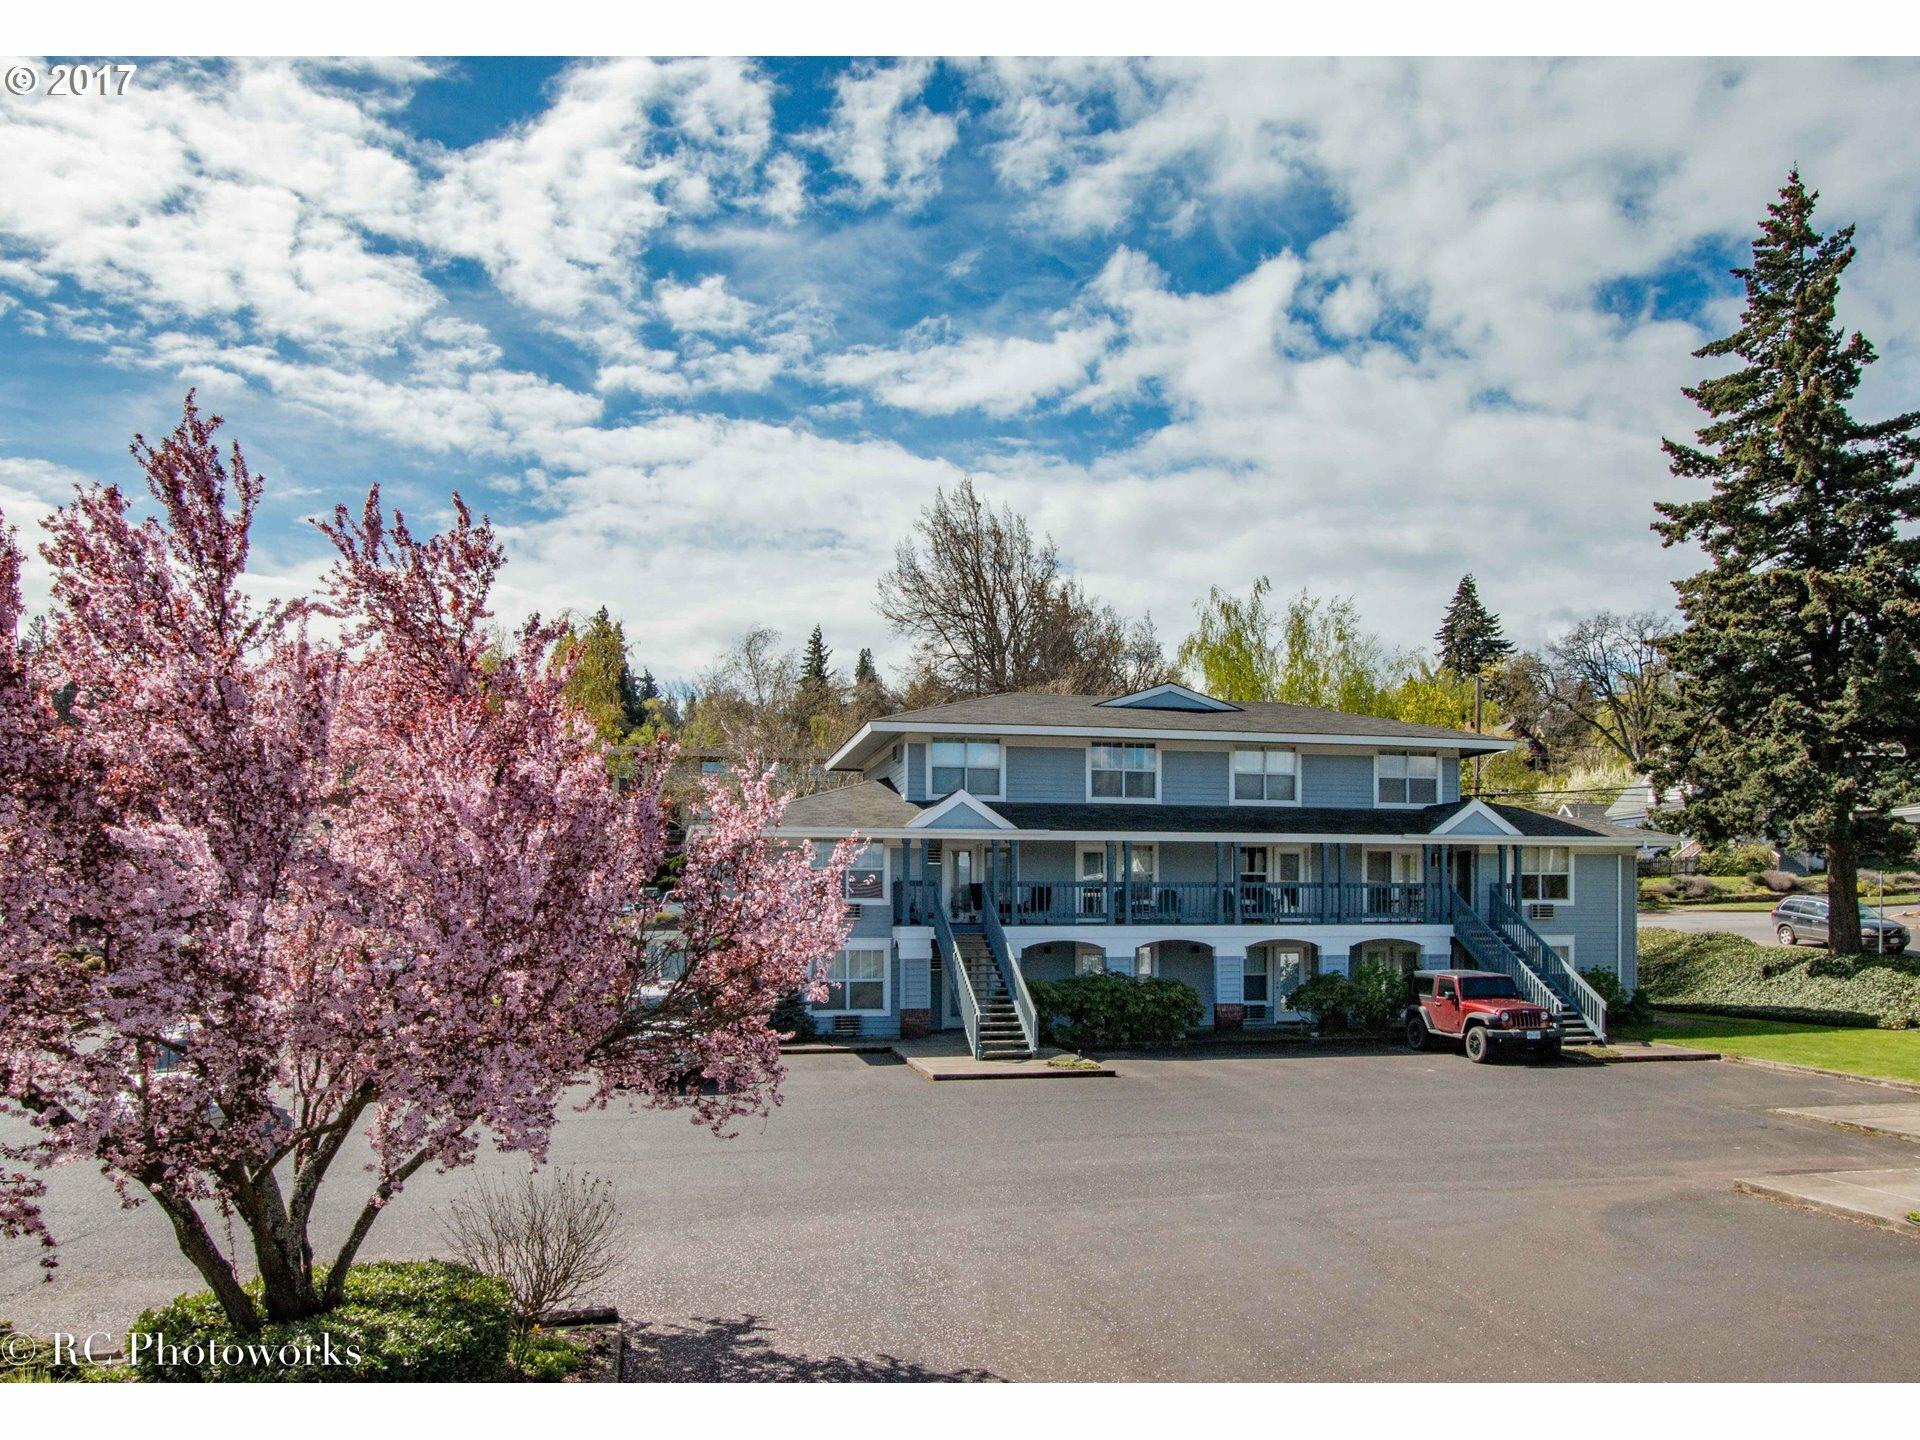 714 Cascade Ave 9, Hood River, OR - USA (photo 1)